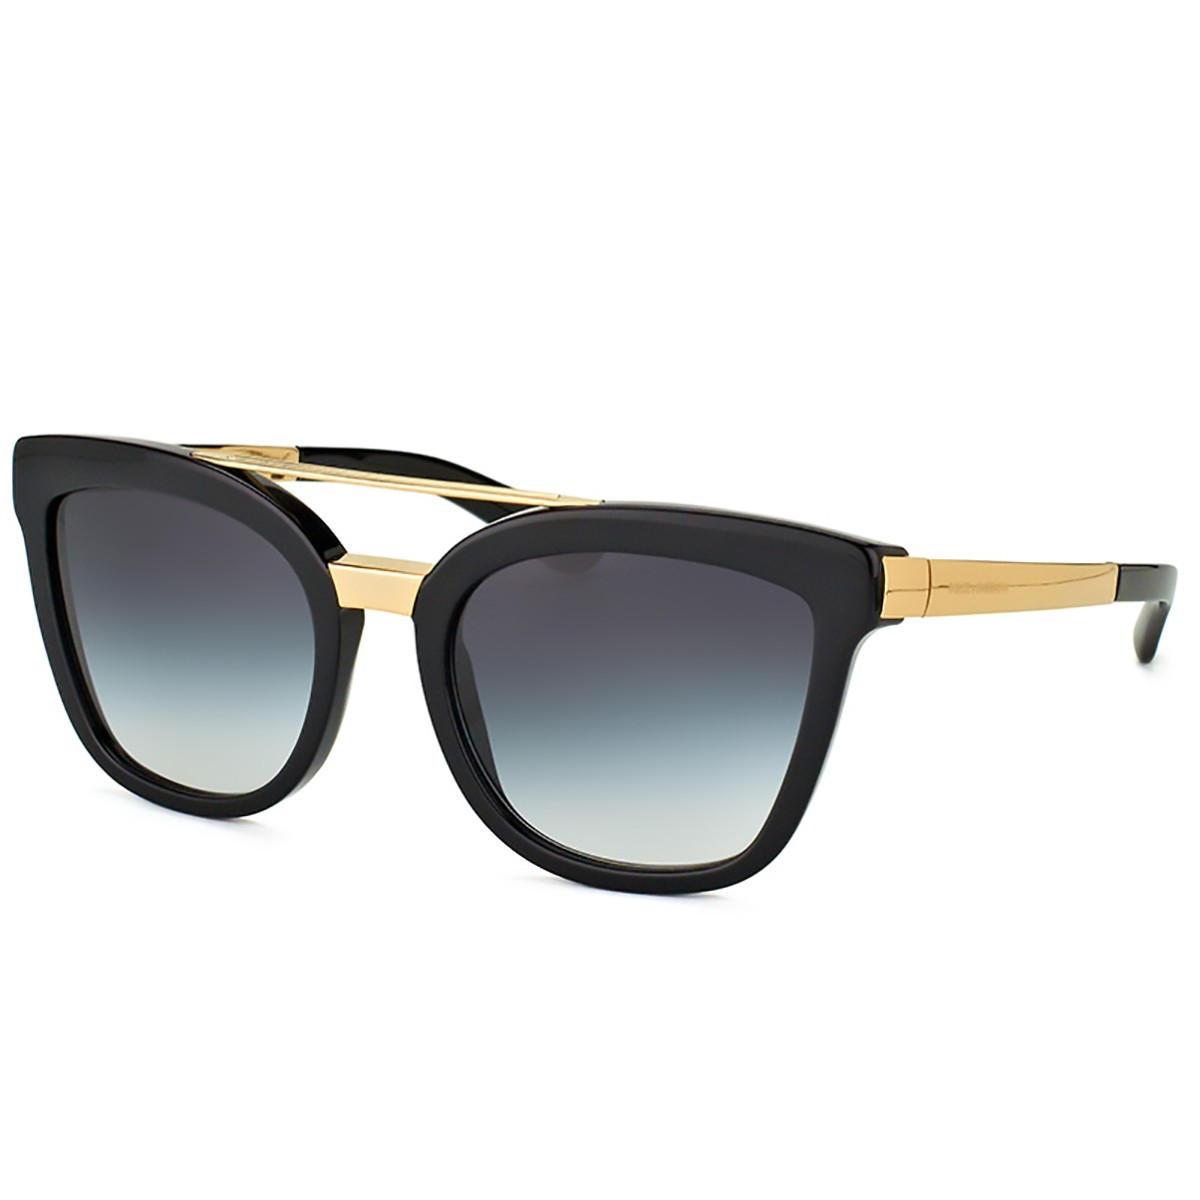 52b4f0ab17875 Compre Óculos de Sol Dolce Gabbana em 10X